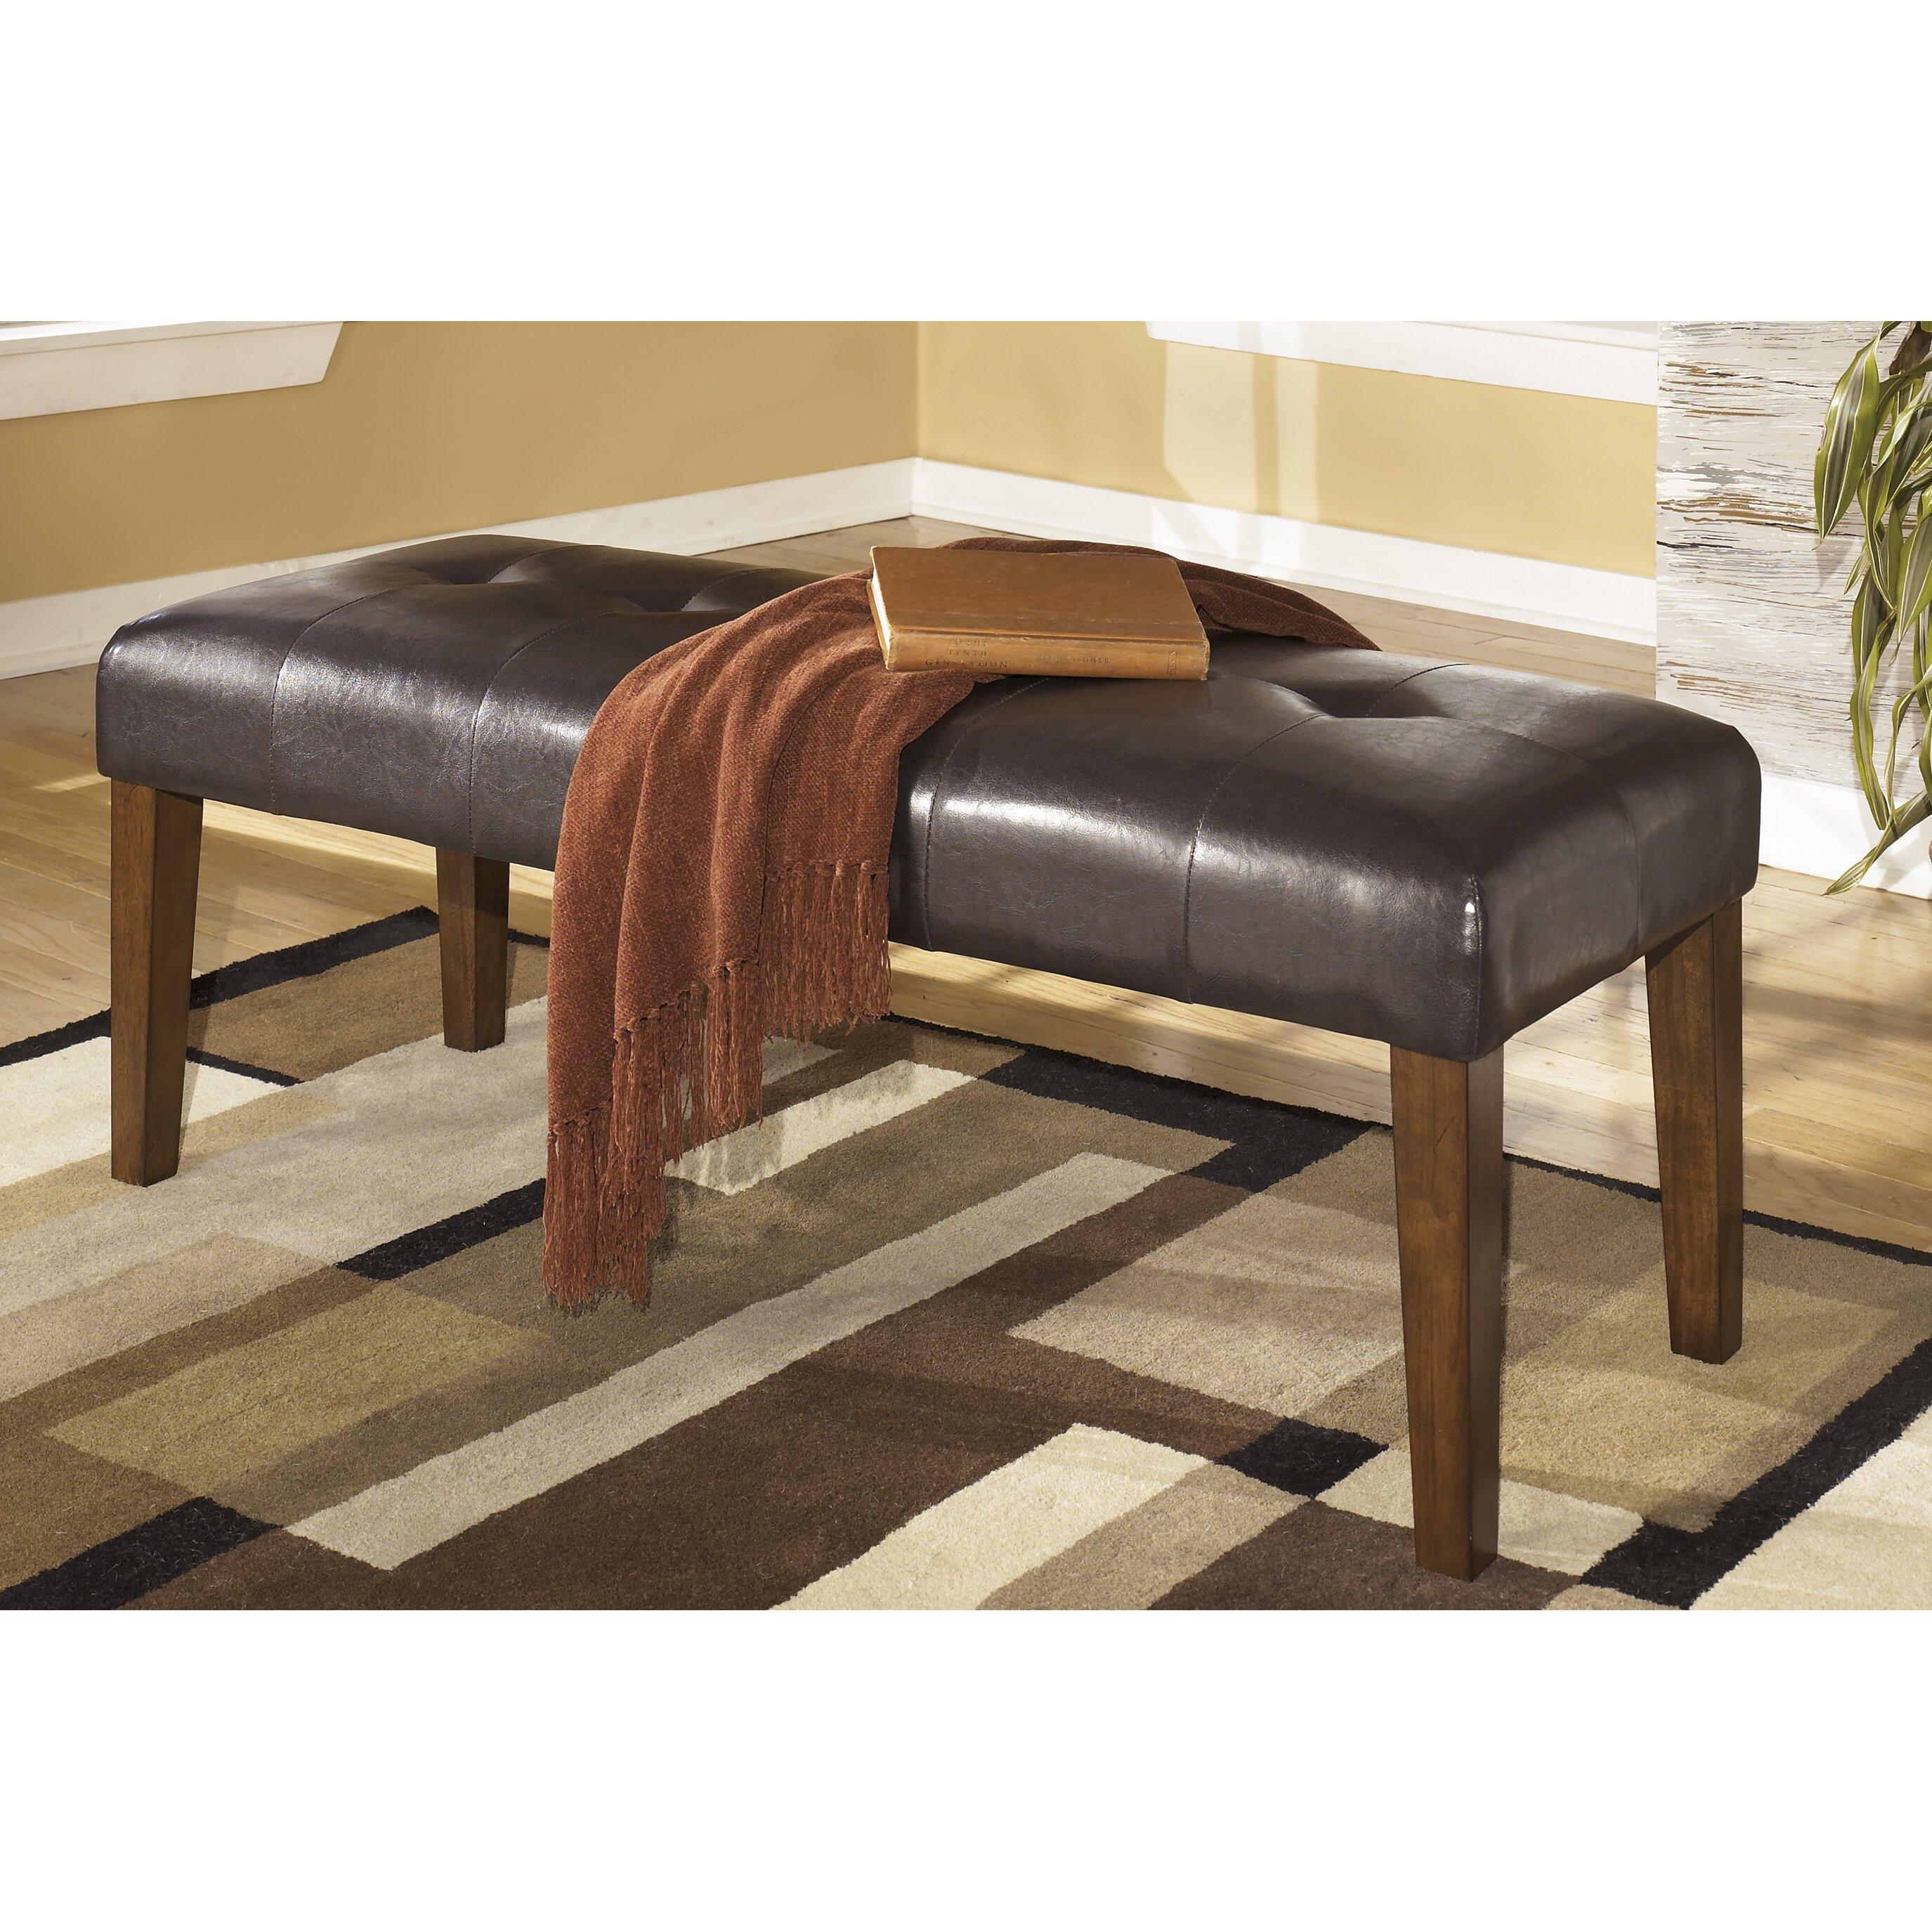 Red Barrel Studio DeMastro Upholstered Kitchen Bench